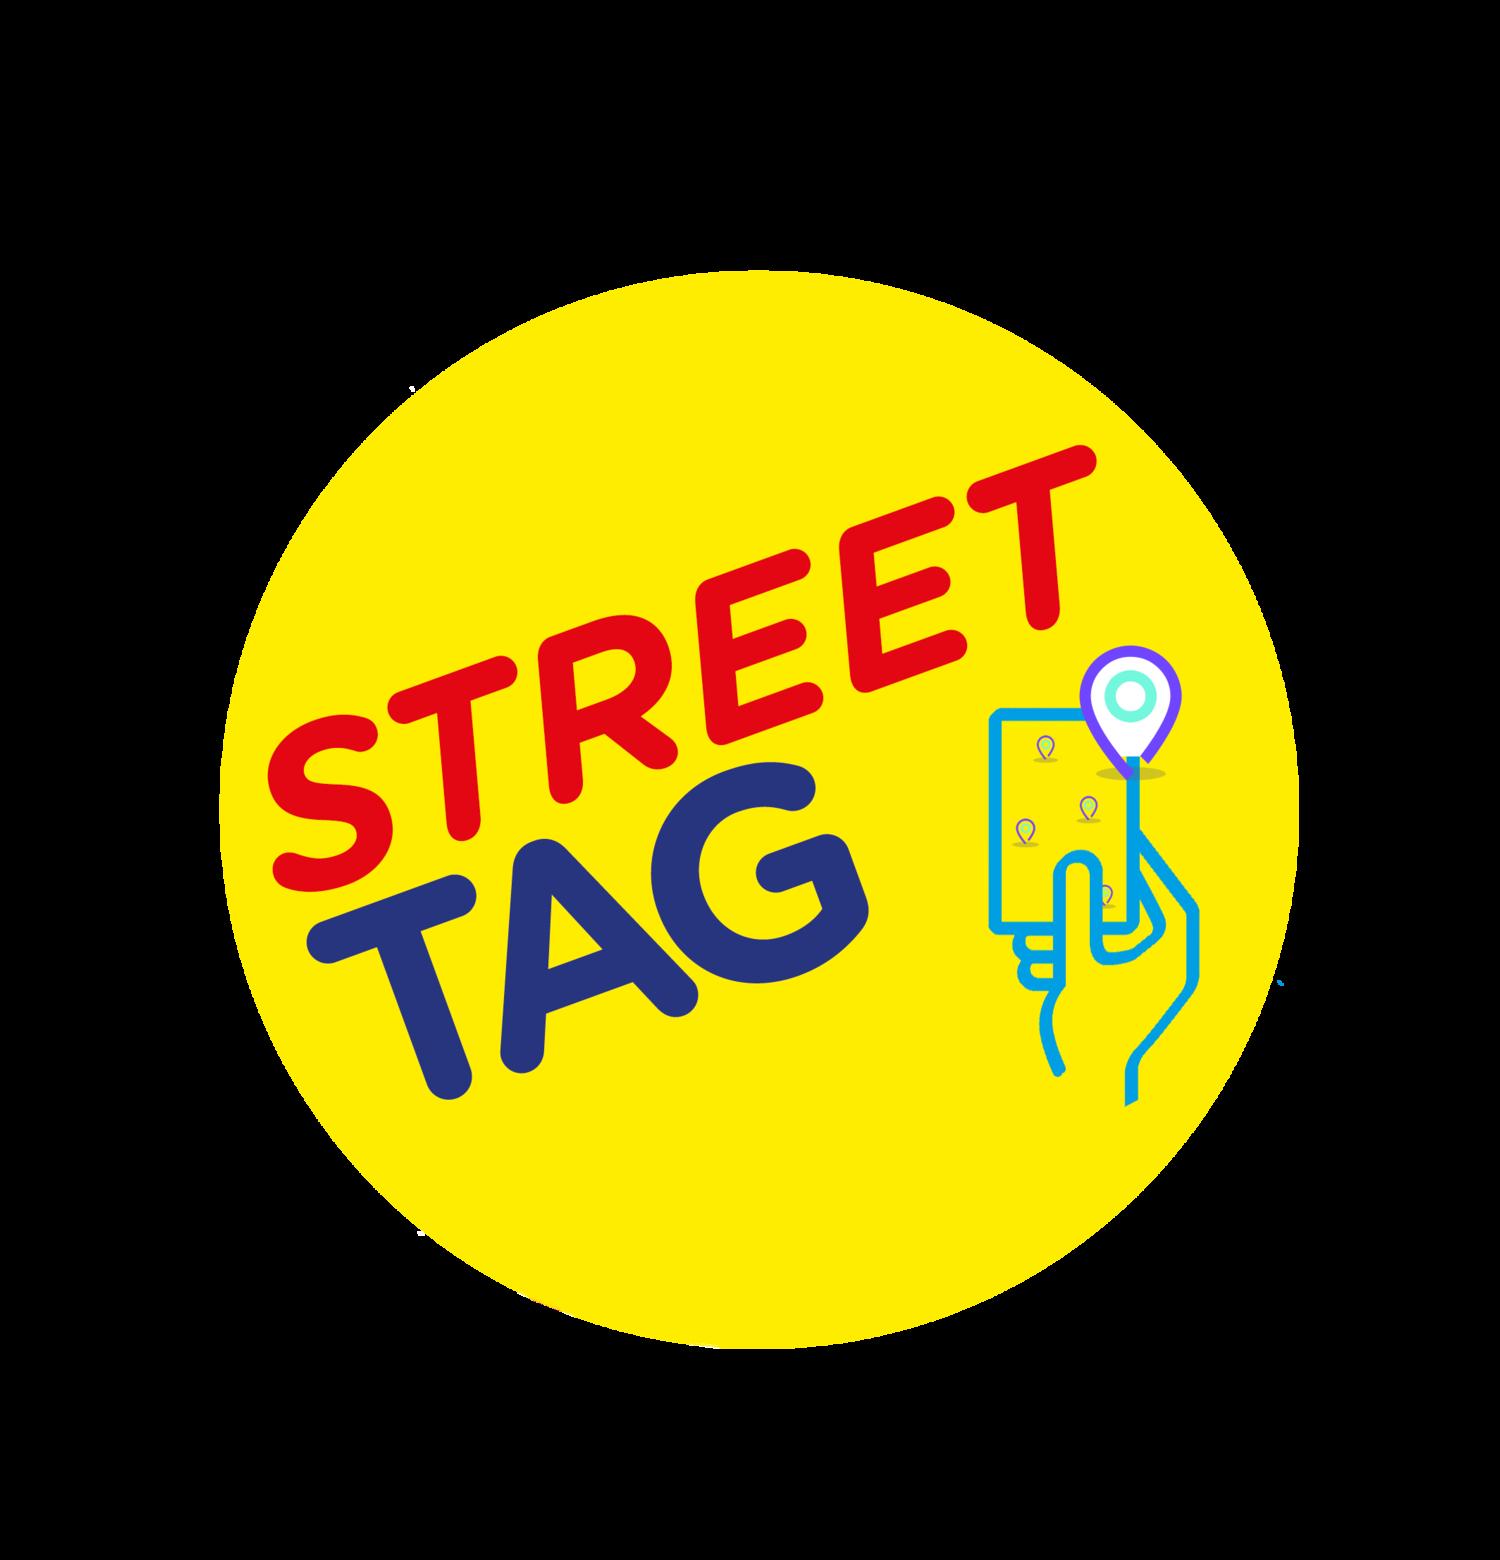 Street Tag